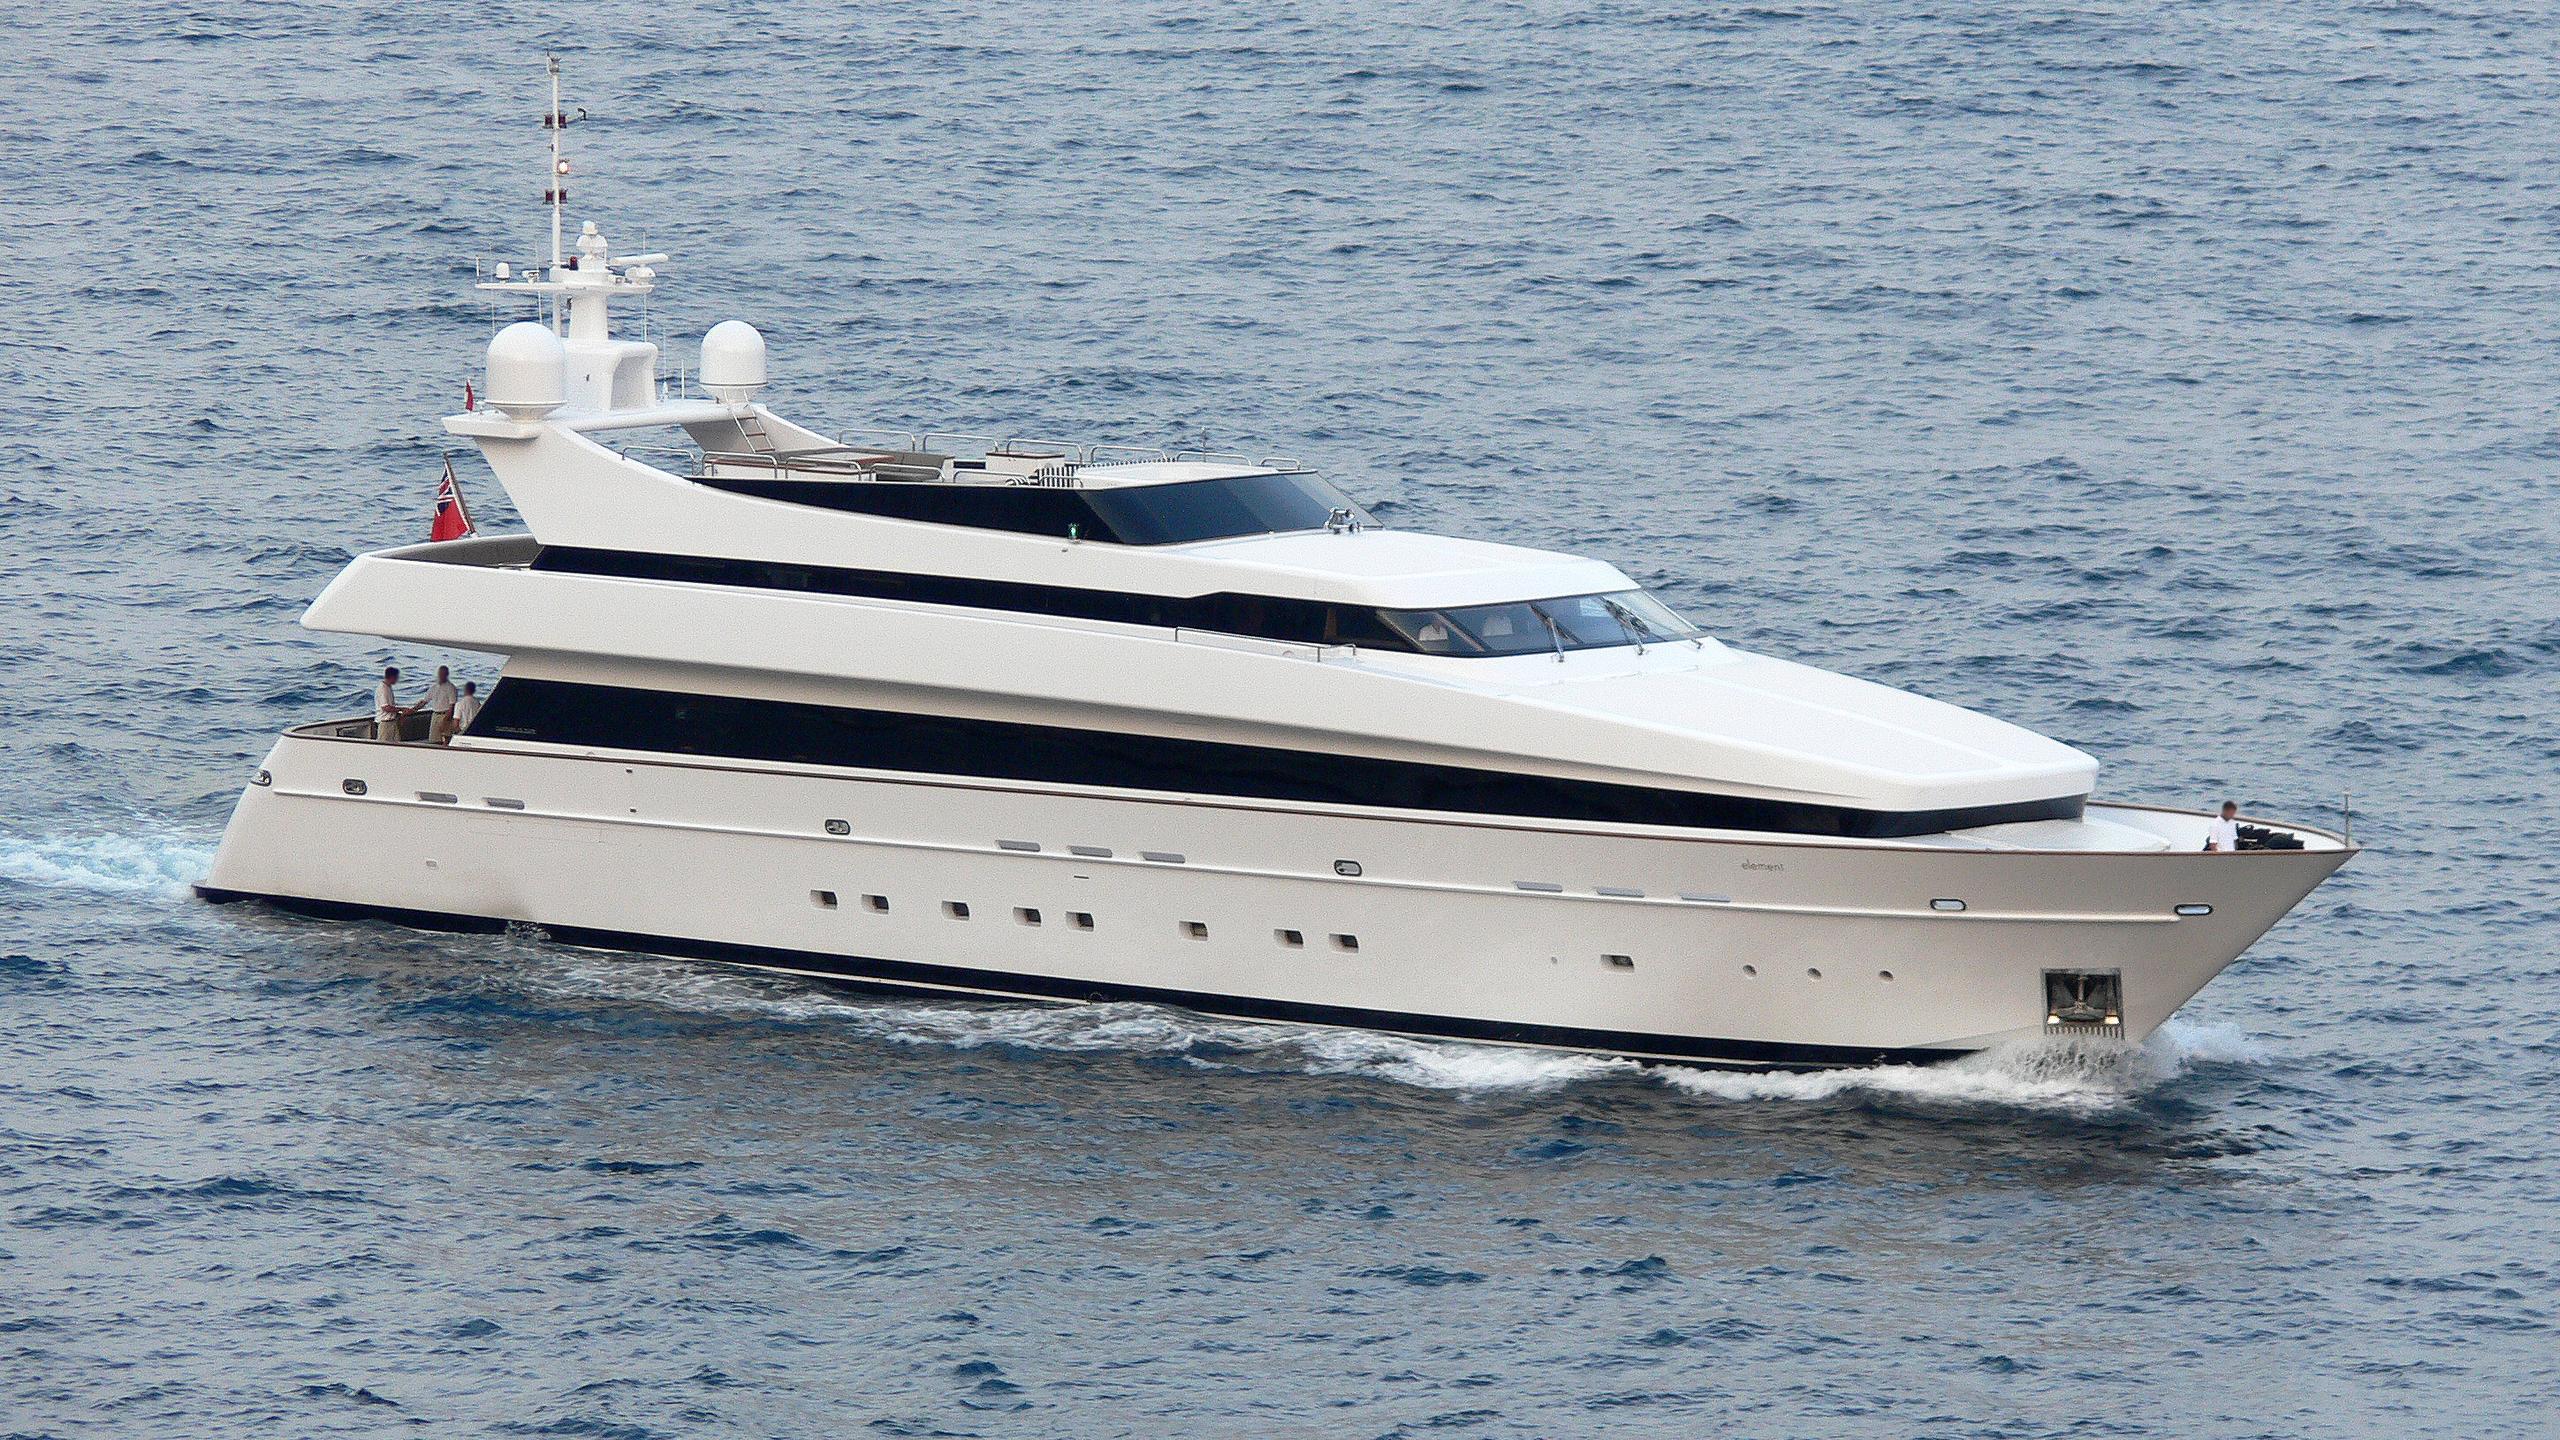 element-motor-yacht-cantieri-di-pisa-2002-42m-profile